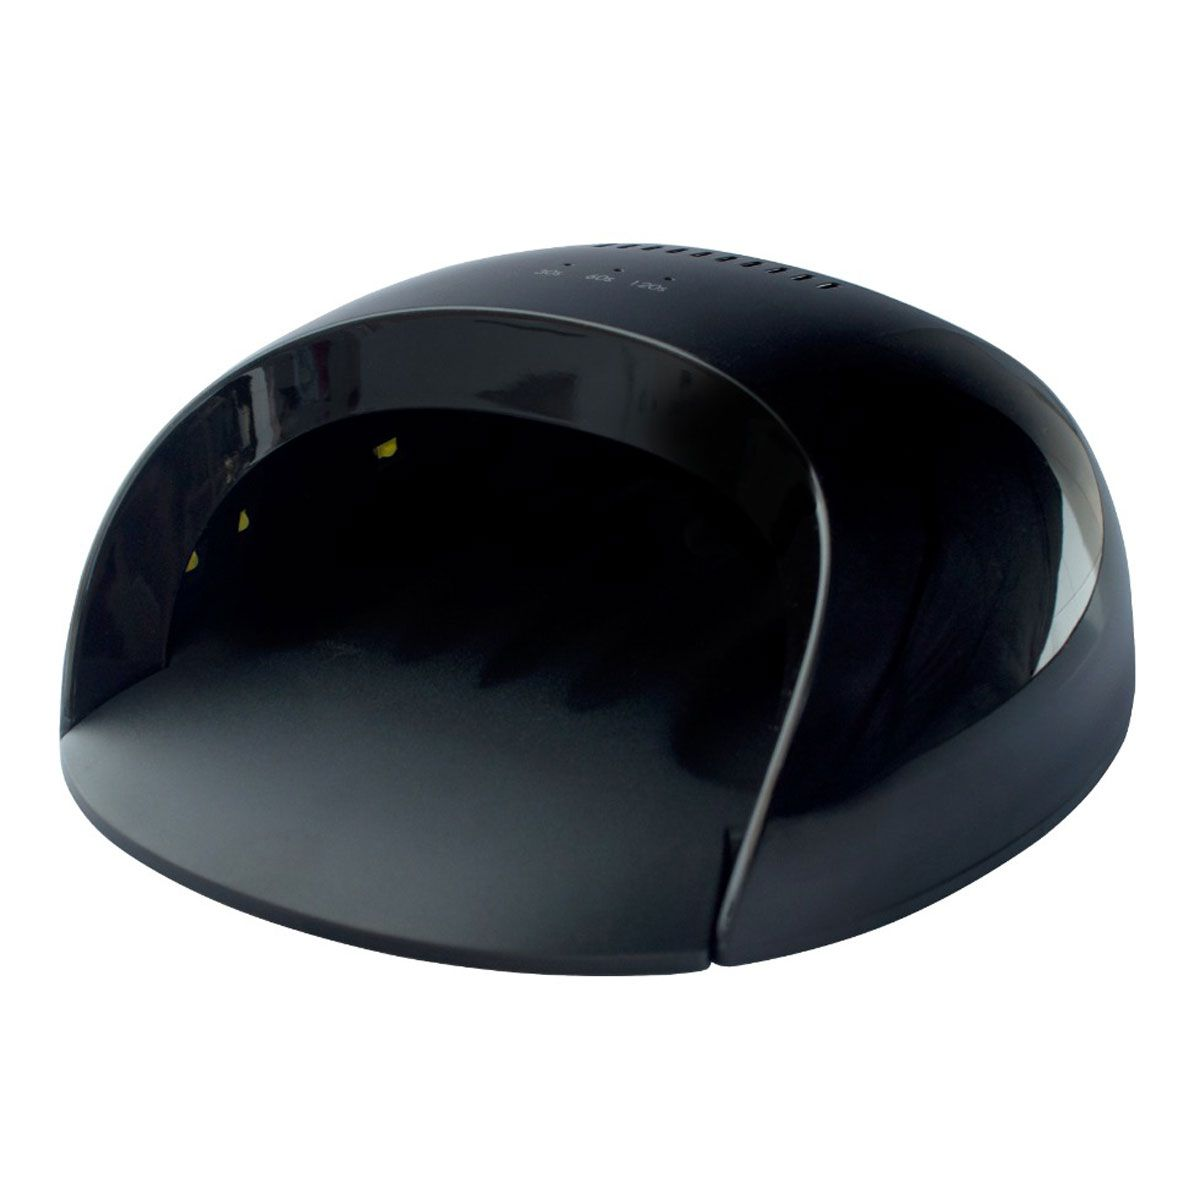 Cabine de Led Nail Lamp Profissional Bivolt Preta